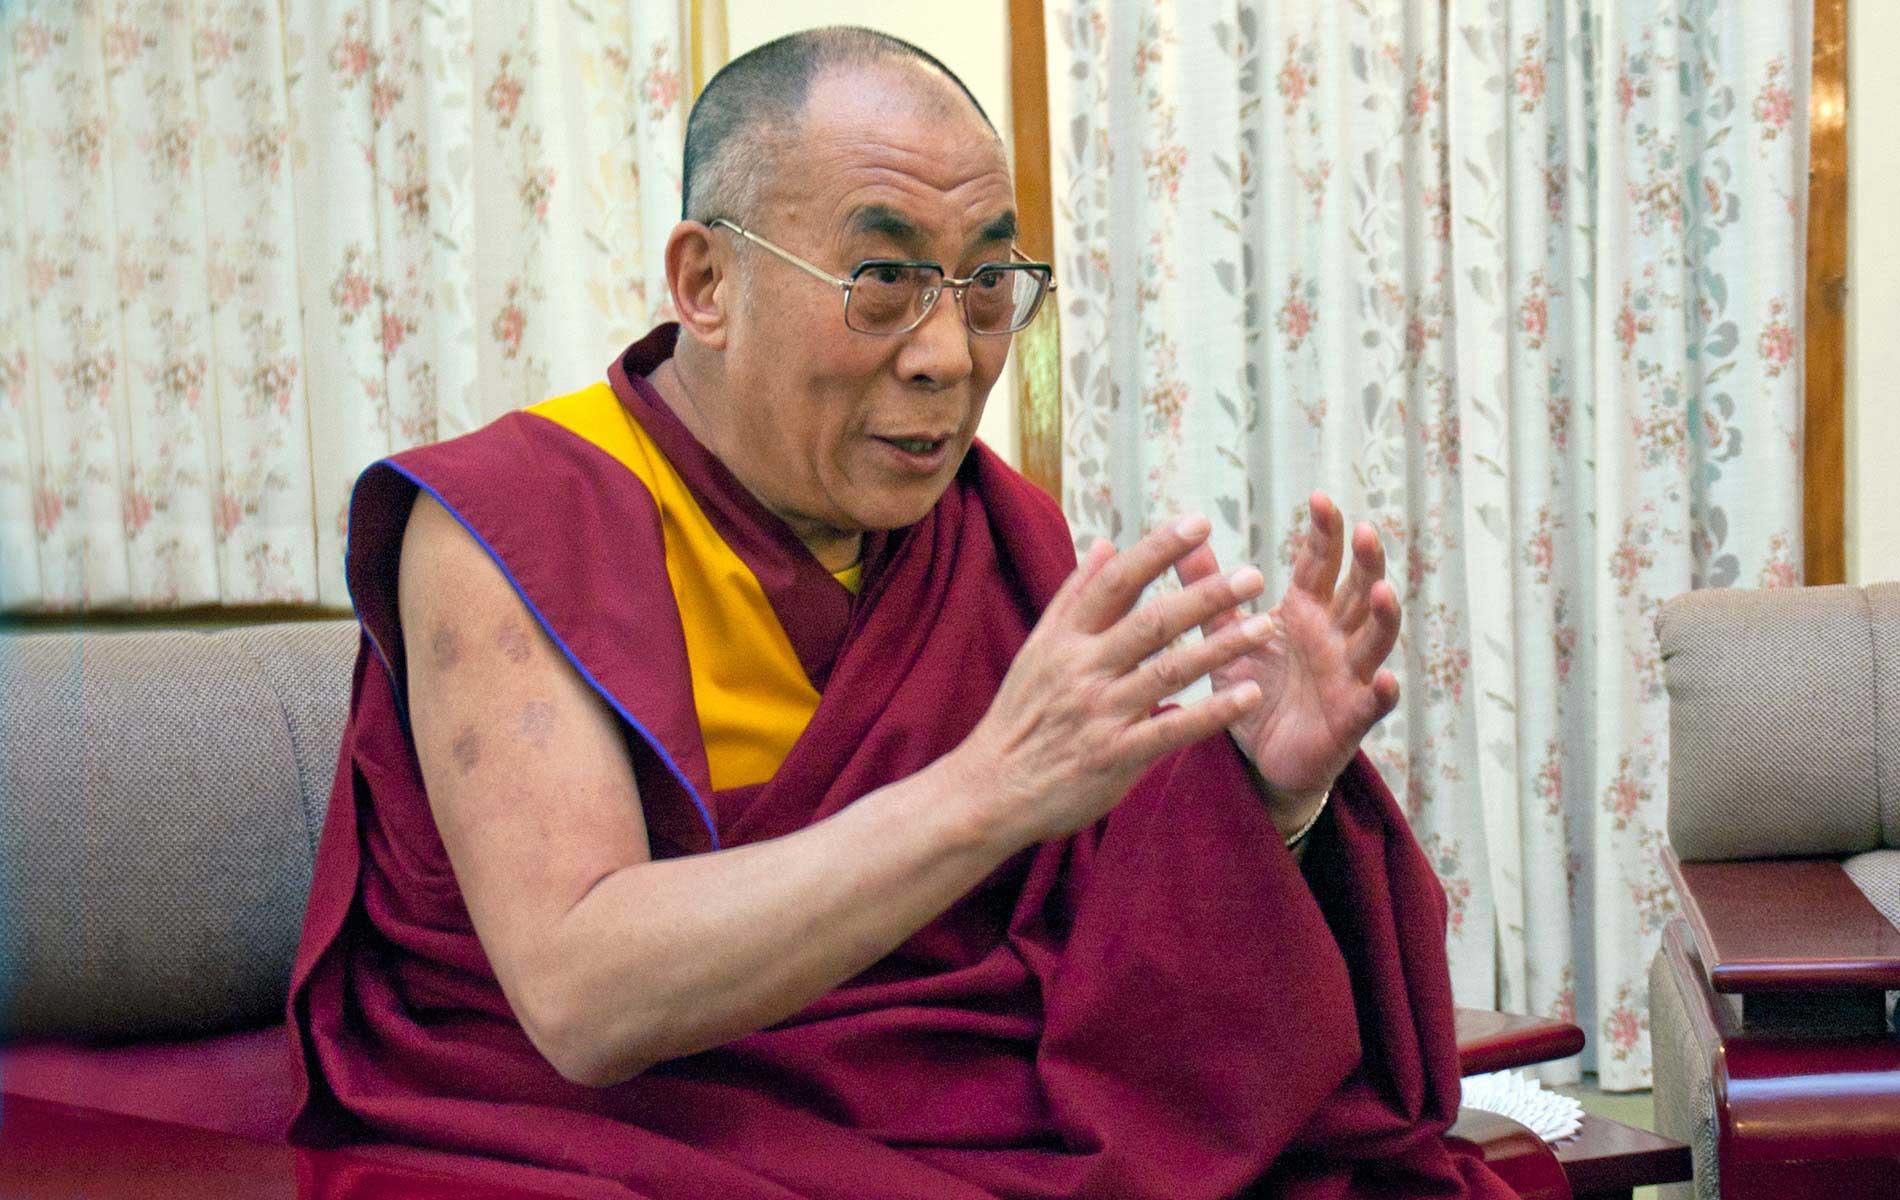 Tenzin Gyatso - H.H The XIV Dalai Lama - India - Daramshala (Himachal Pradesh - India) - © Graziano Villa